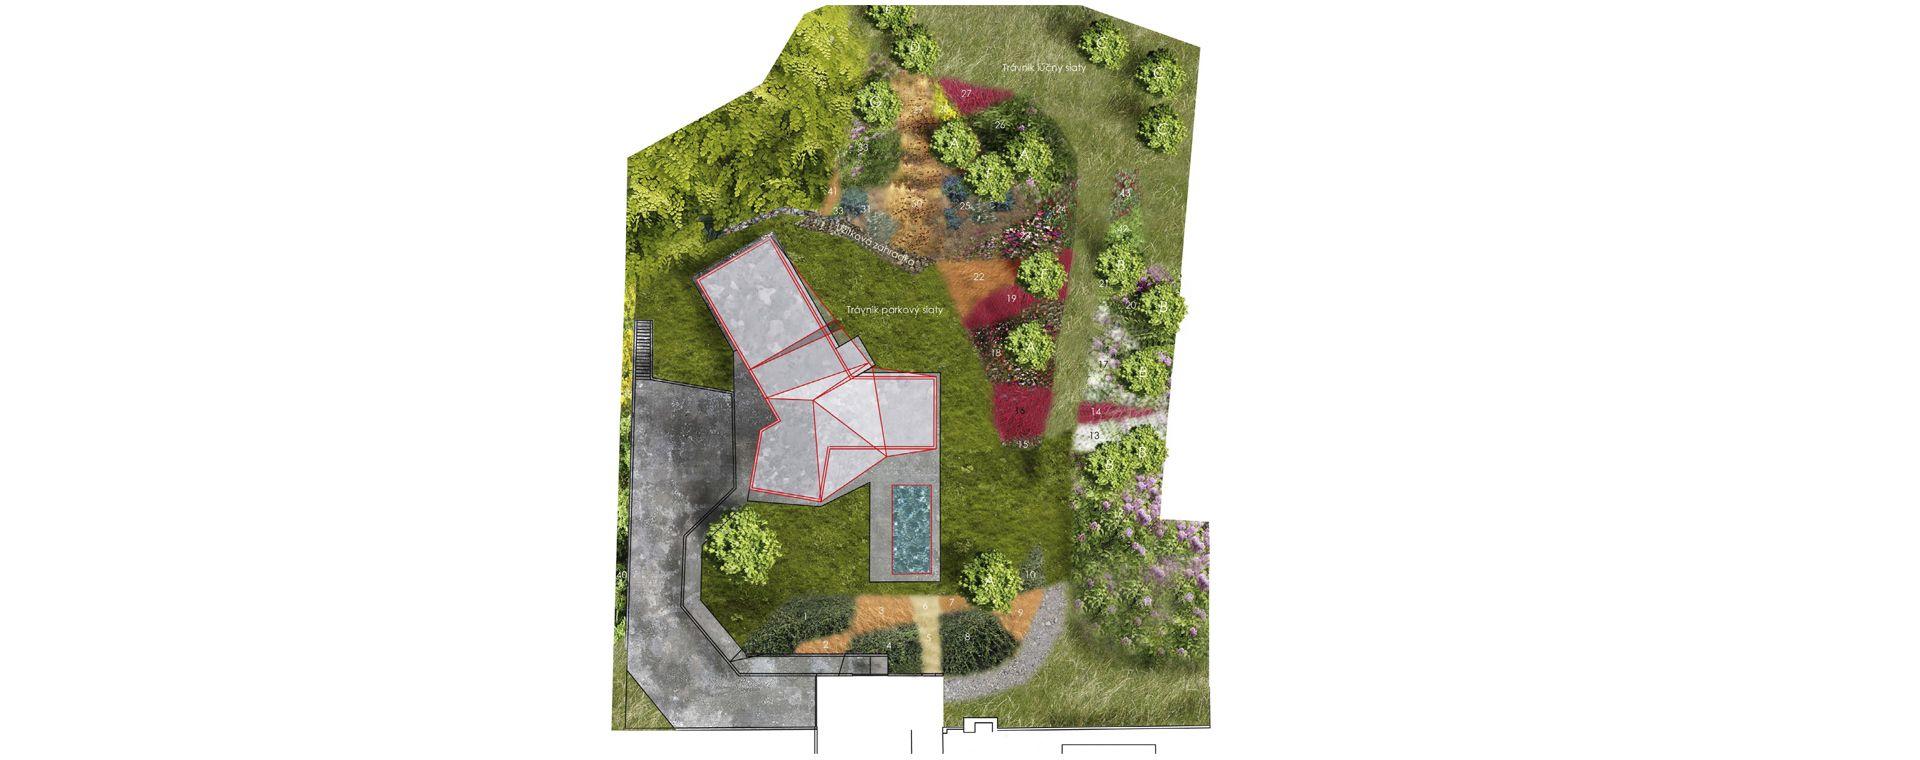 Garden Záhorská Bystricka, concept, SK